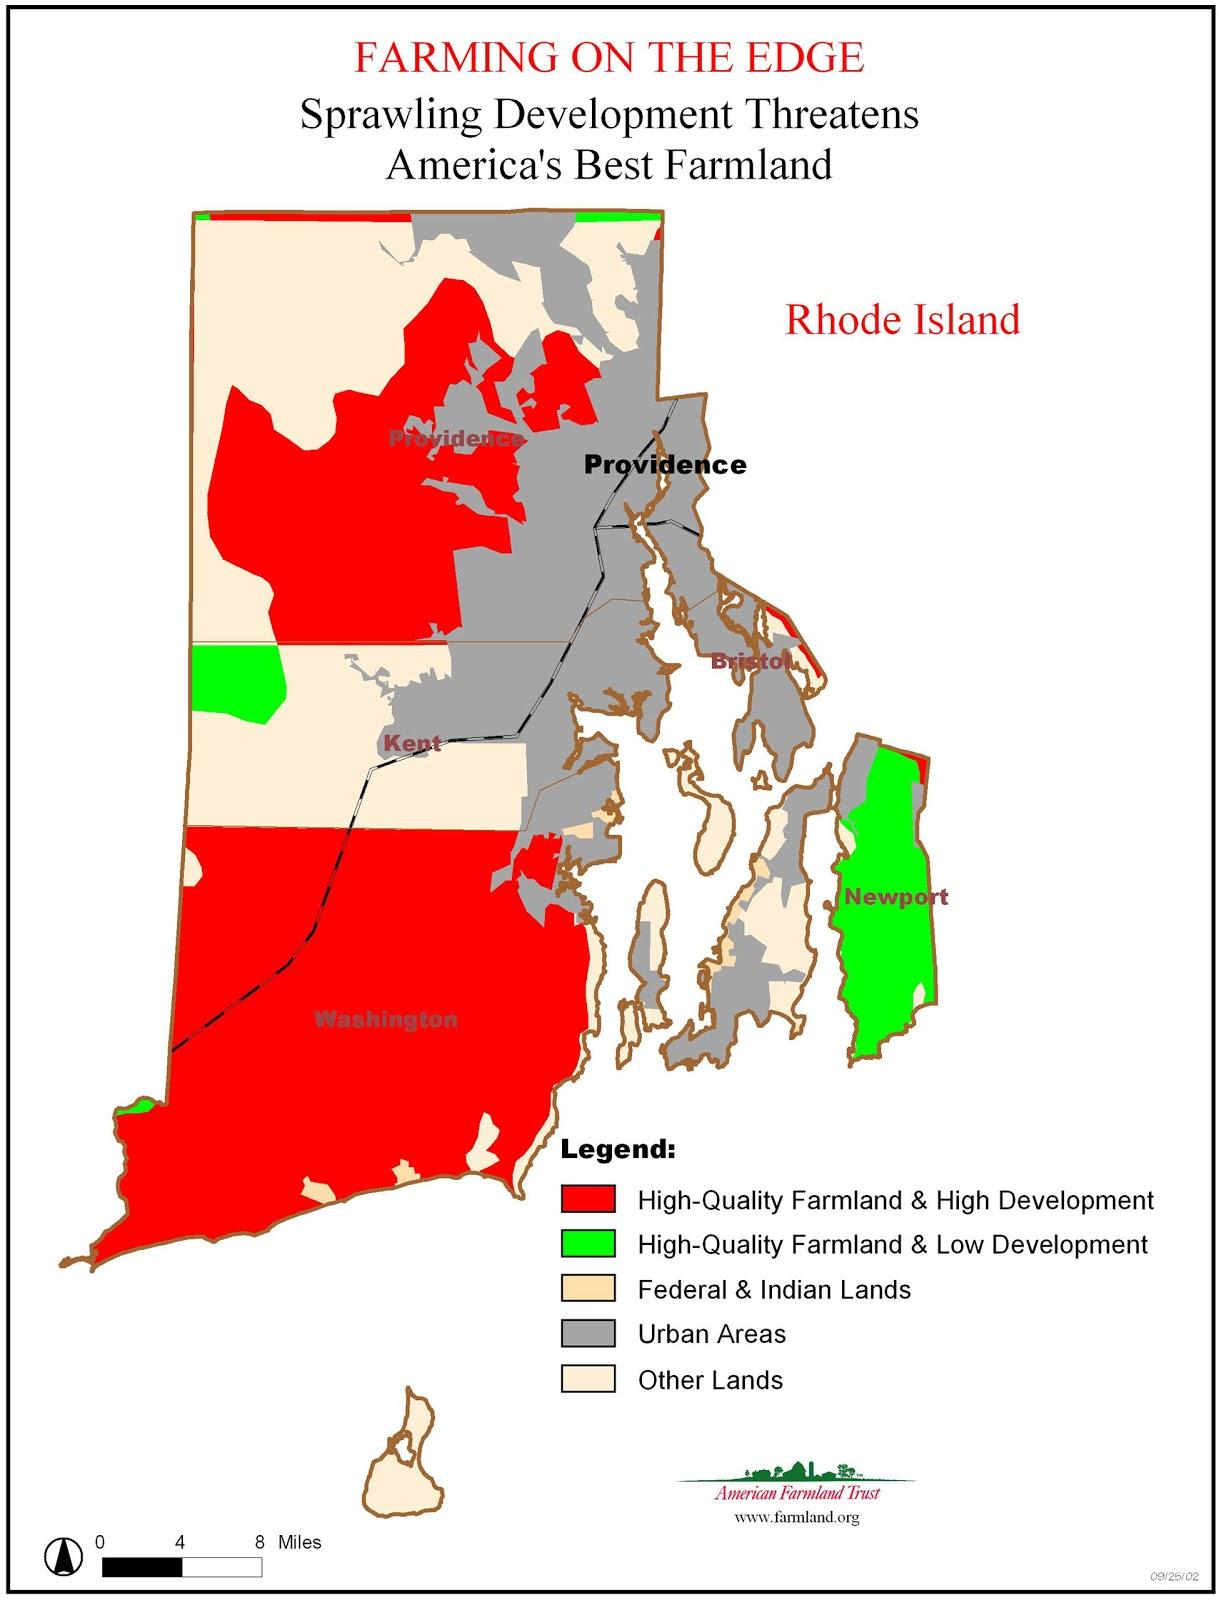 Rhode Island Resource Recovery Corporation Rfp